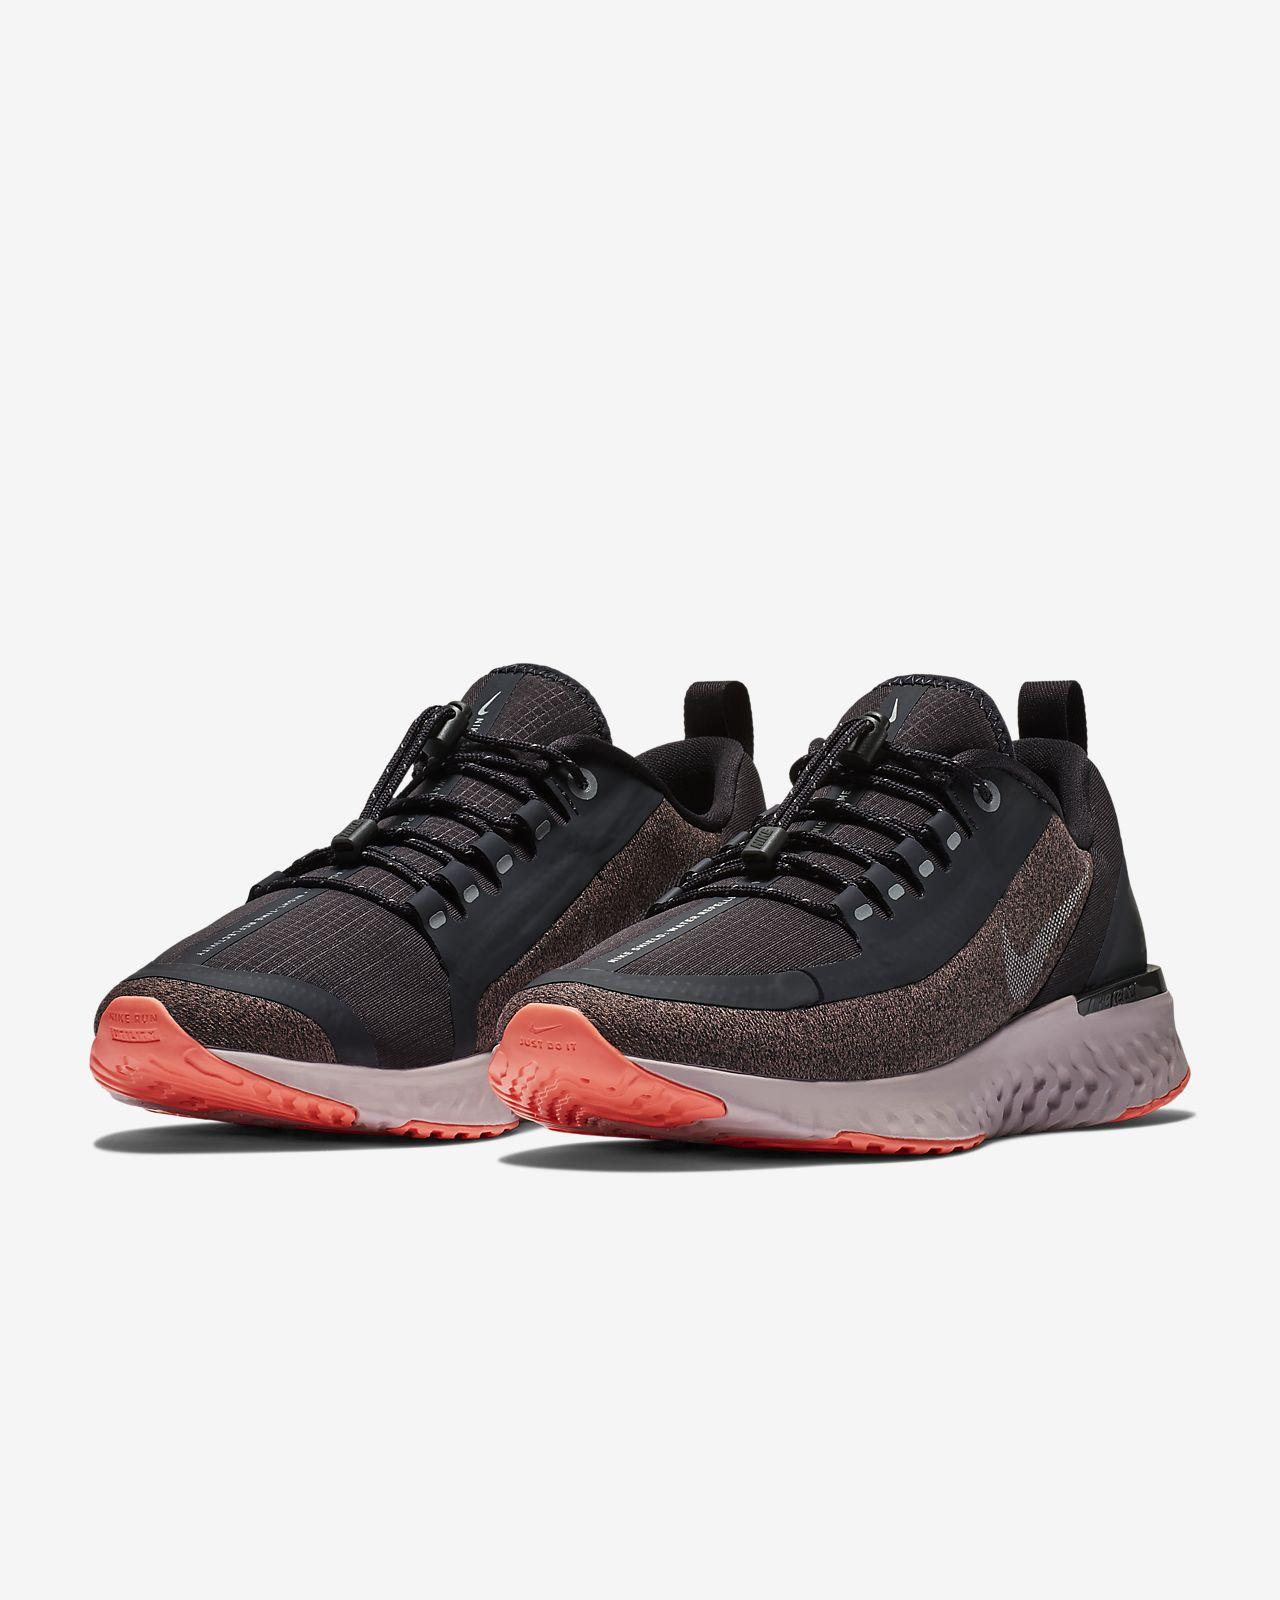 buy popular 7493c 91a60 Nike Odyssey React Shield Water-Repellent-løbesko til kvinder. Nike ...